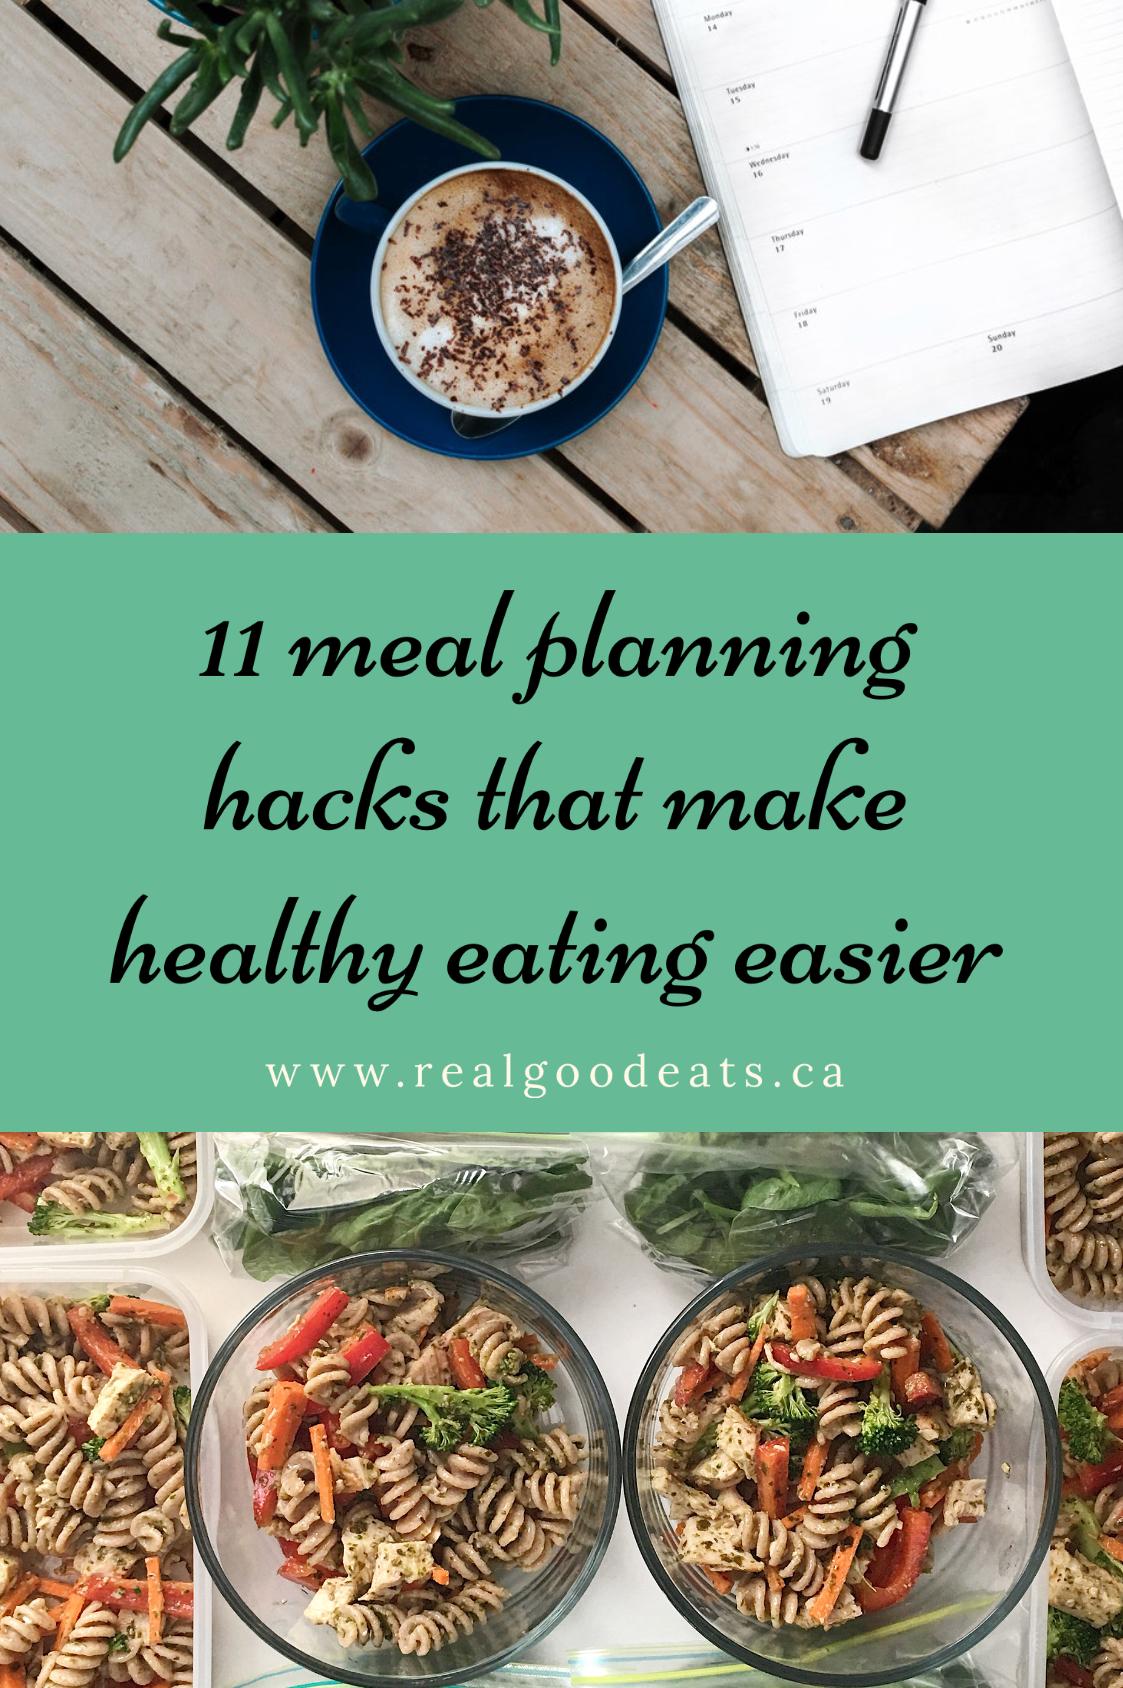 11 Meal Planning Hacks that Make Healthy Eating Easier